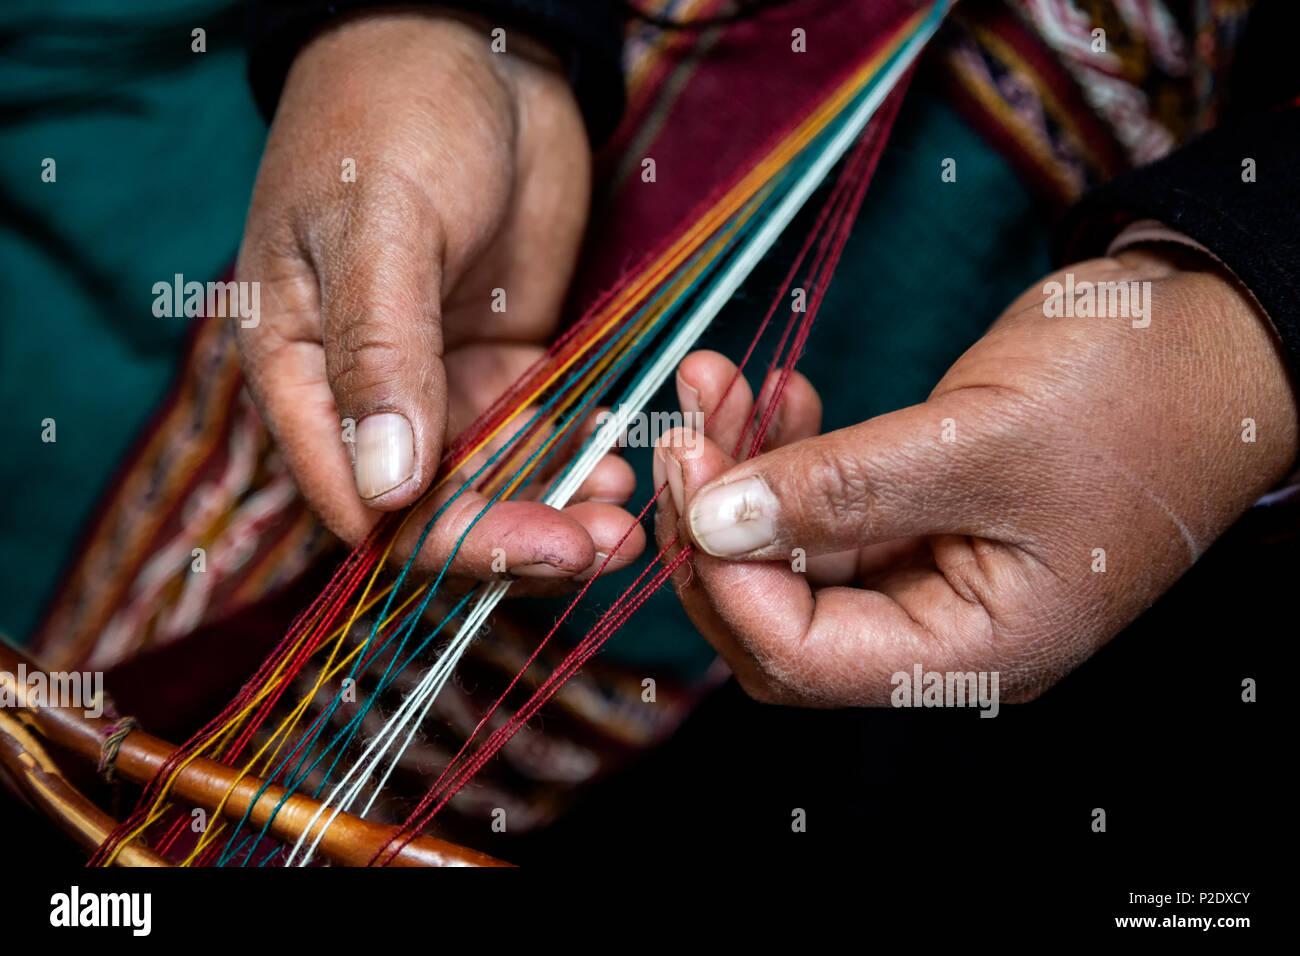 Hands of Quechua woman demonstrating weaving techniques, El Balcon del Inka, Chinchero, Cusco, Peru - Stock Image